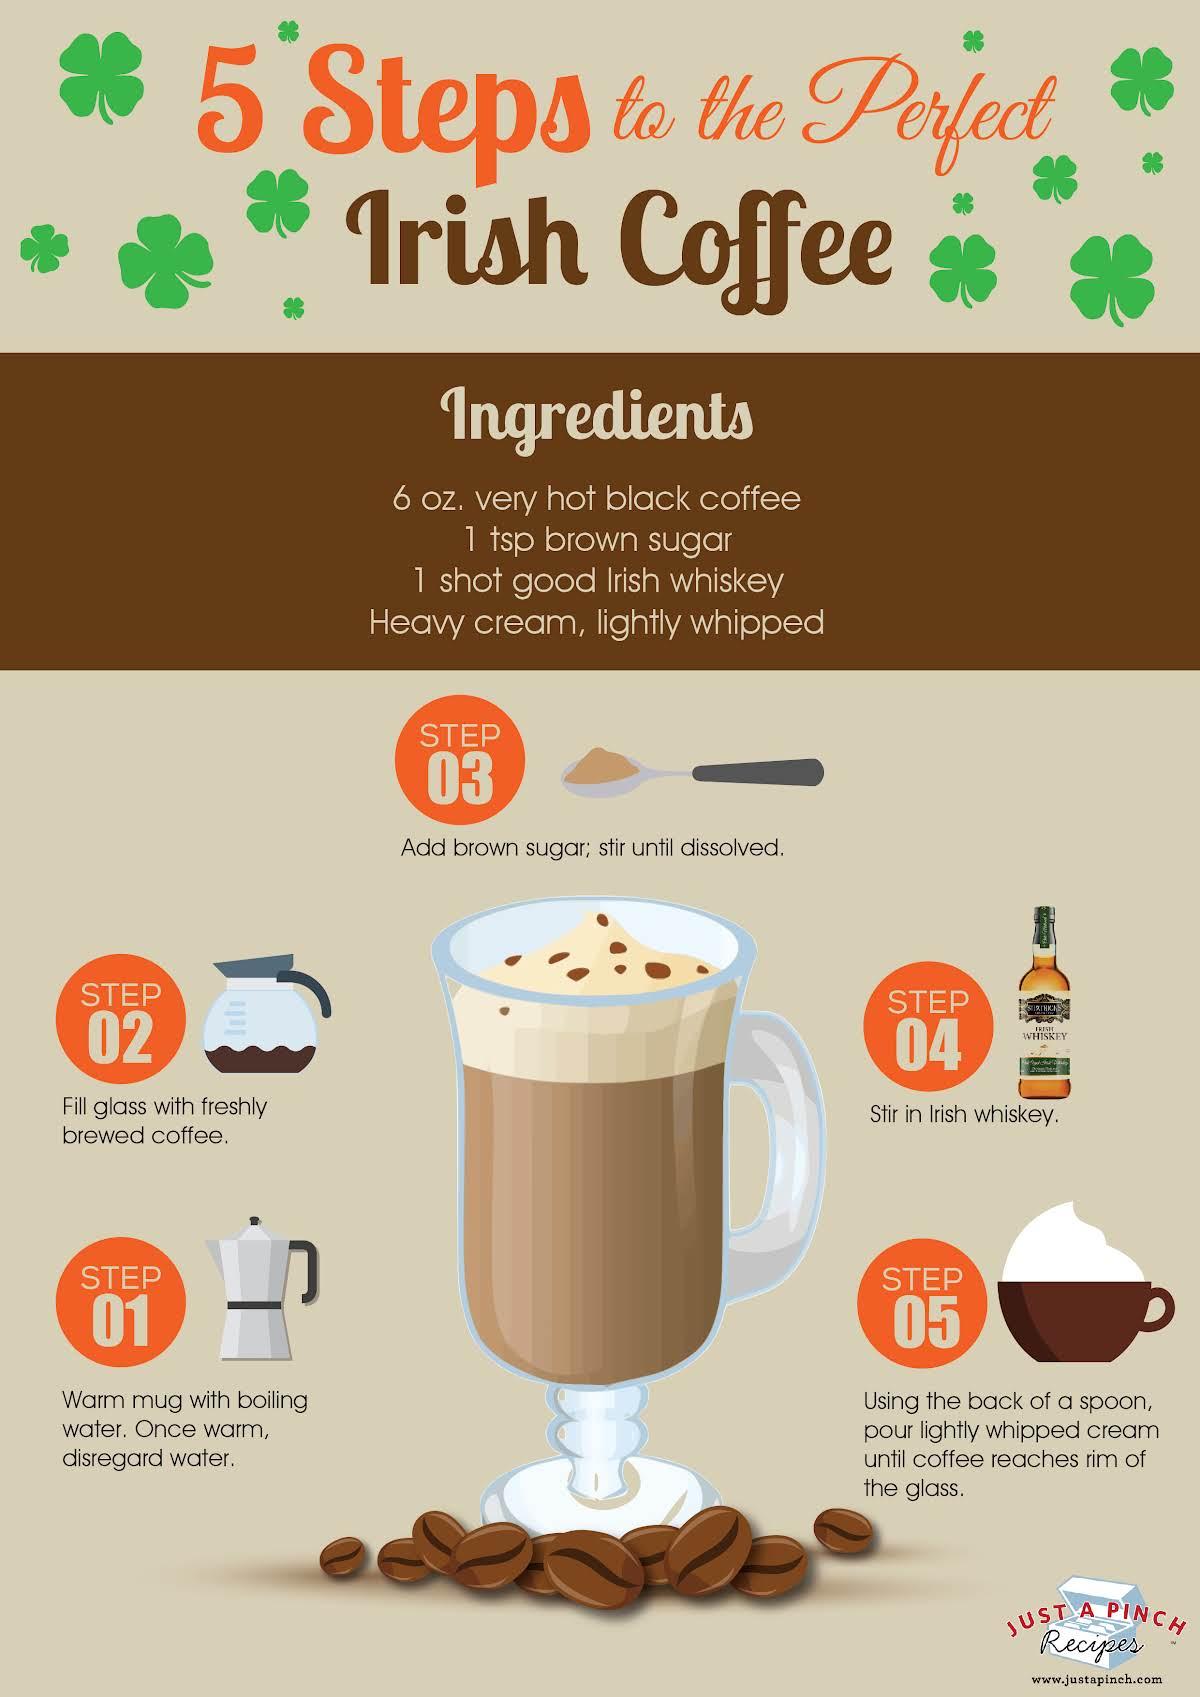 5 Steps to the Perfect Irish Coffee